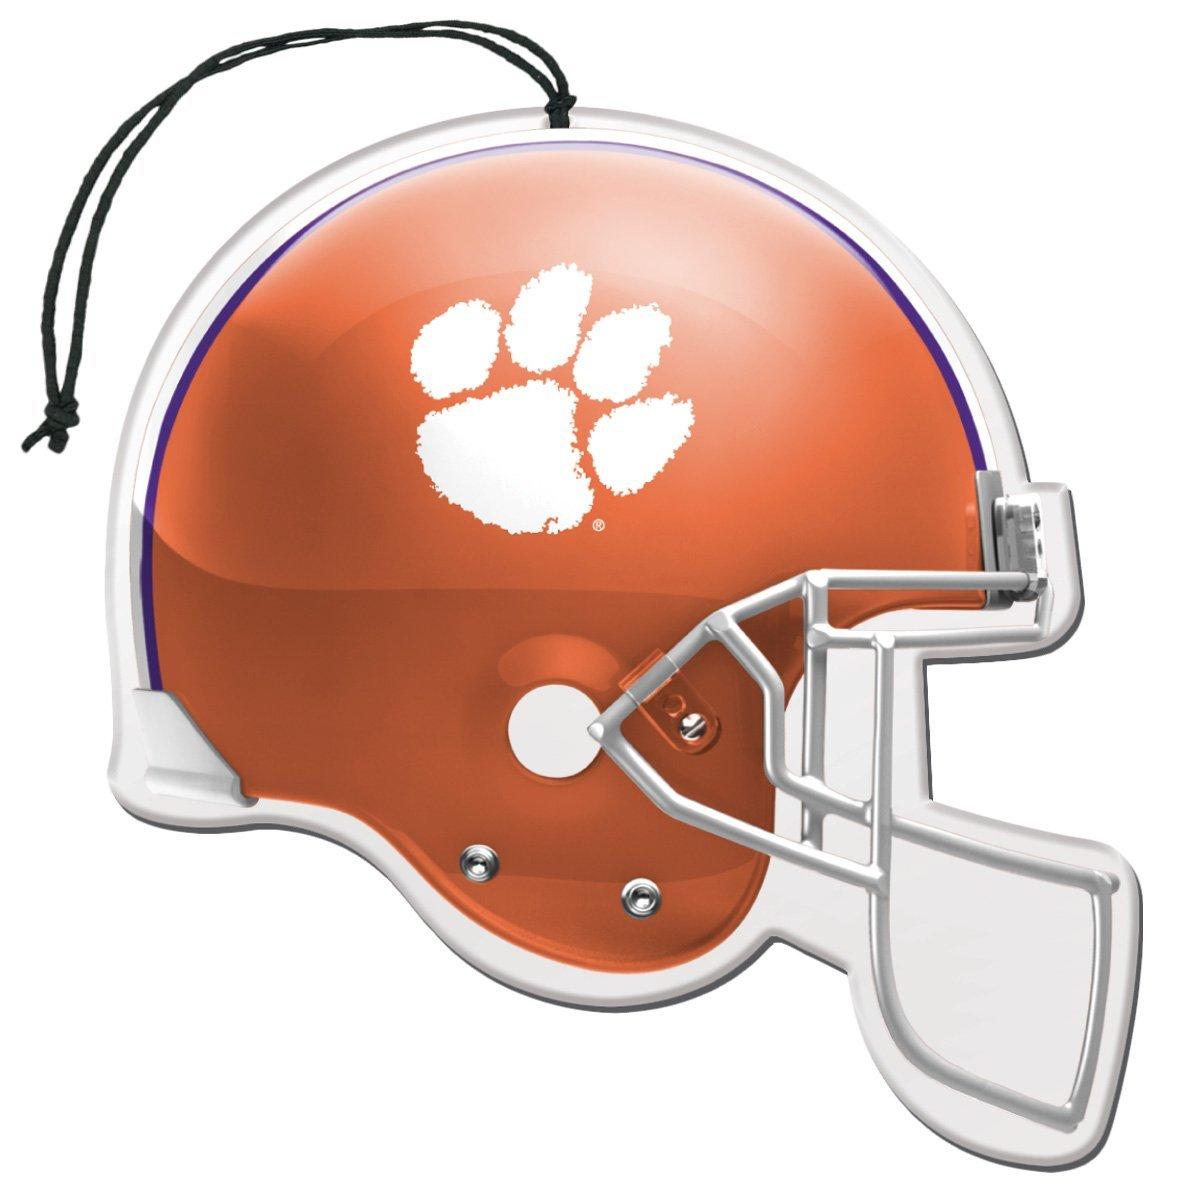 NCAA Clemson Tigers Auto Air Freshener, 3-Pack